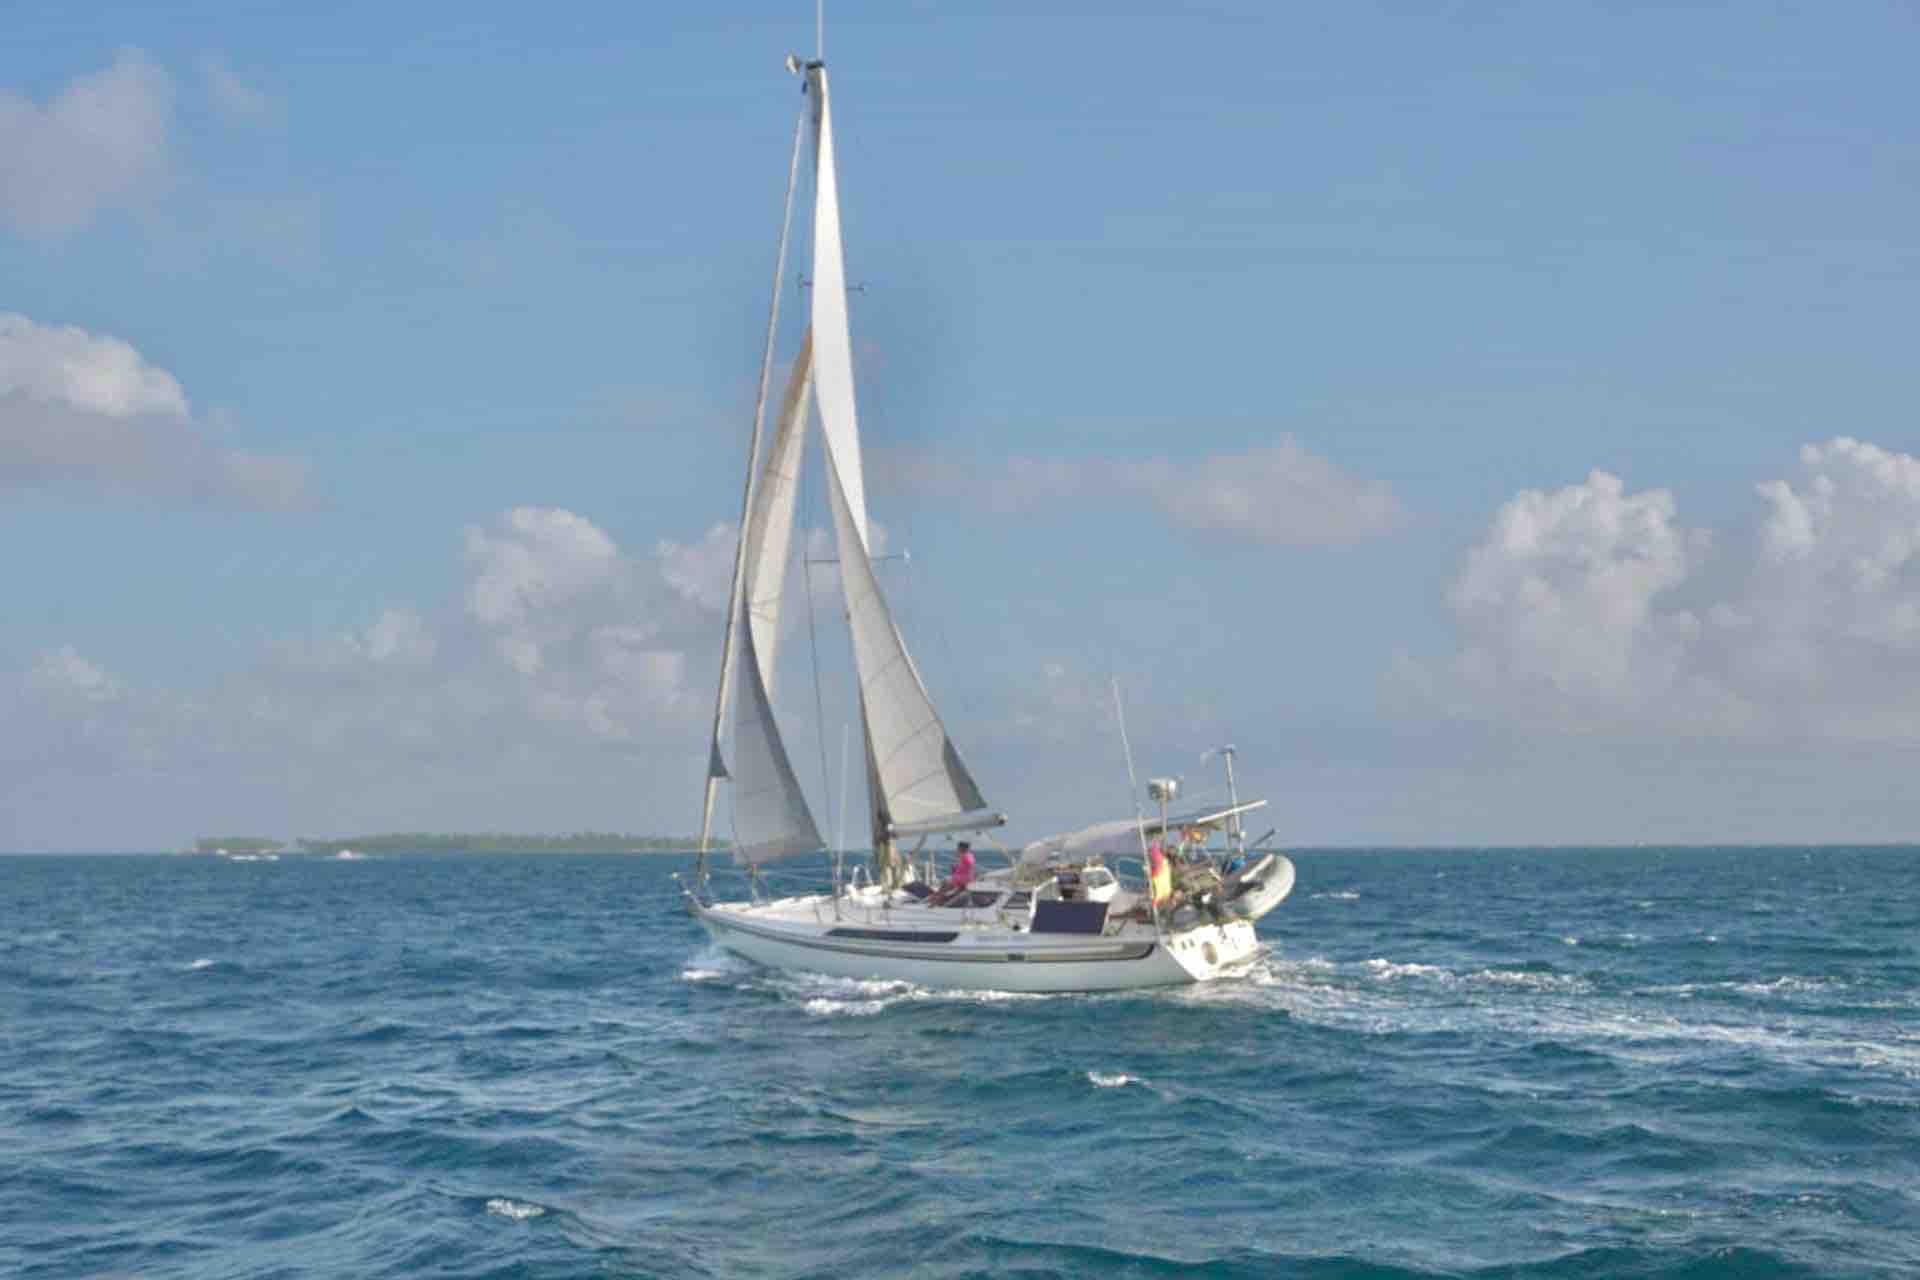 Dike sailboat San Blas sailing